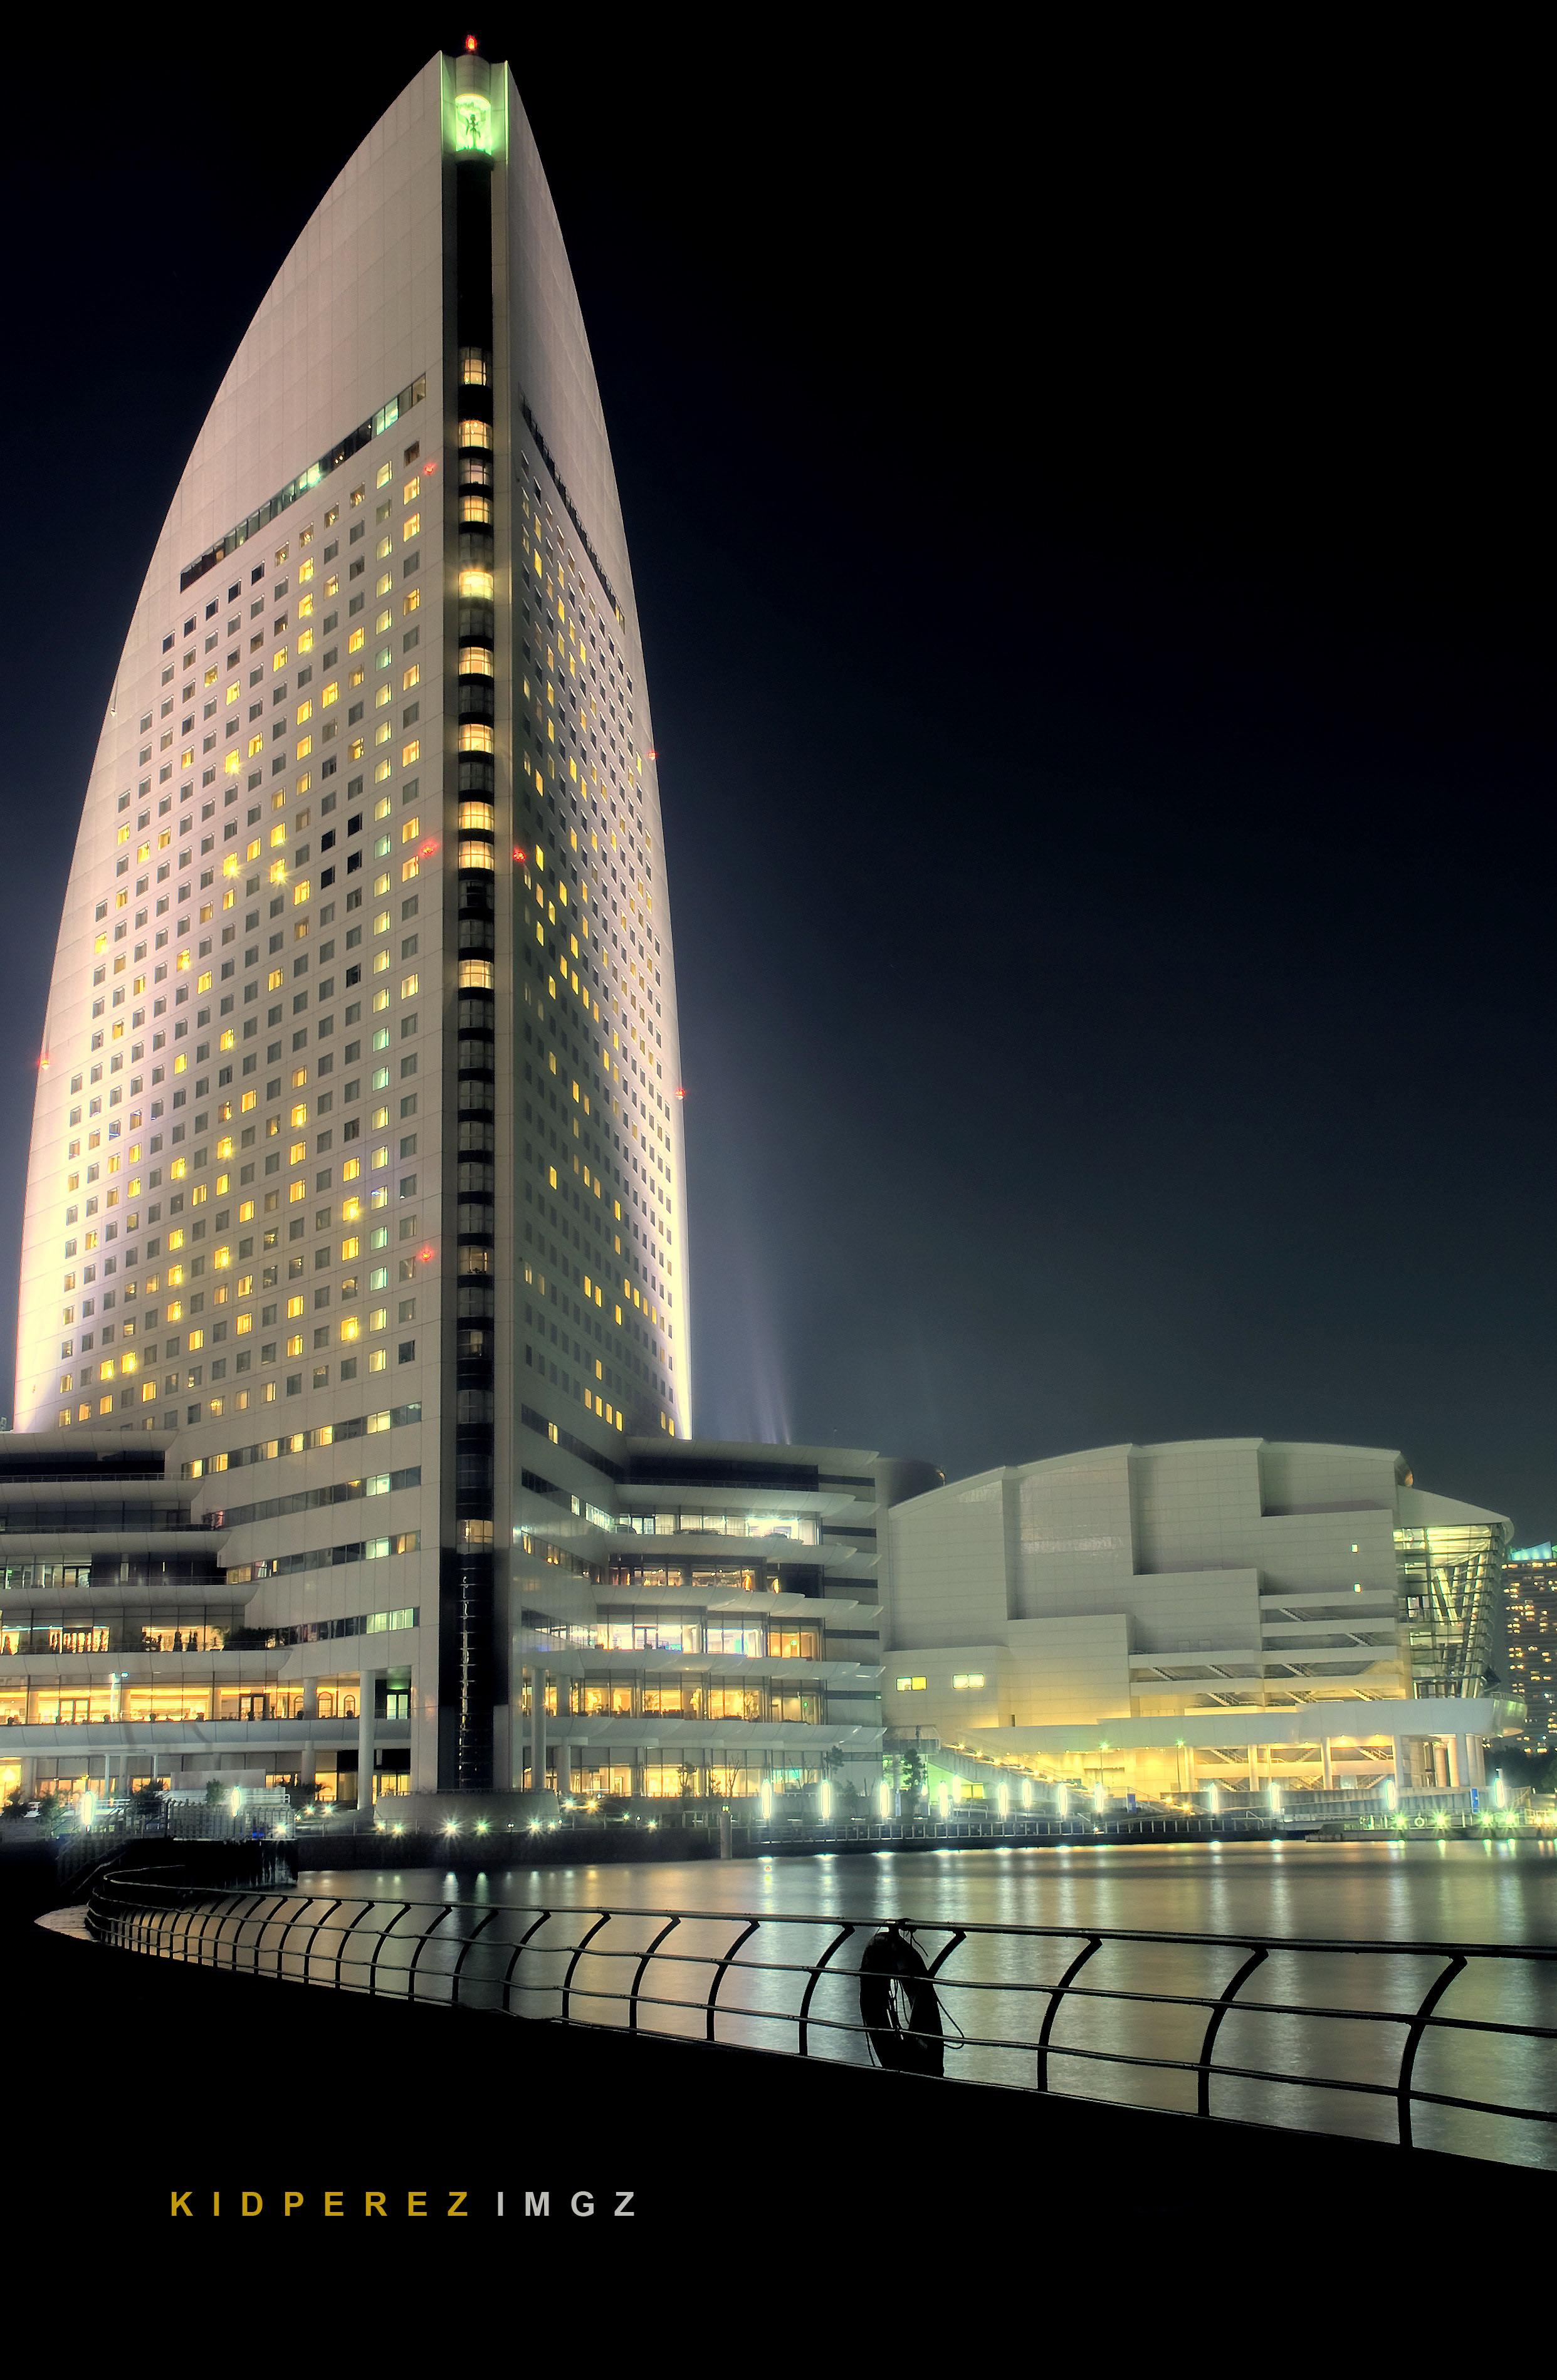 Intercontinental hotel kansas city hotel for Hotel international